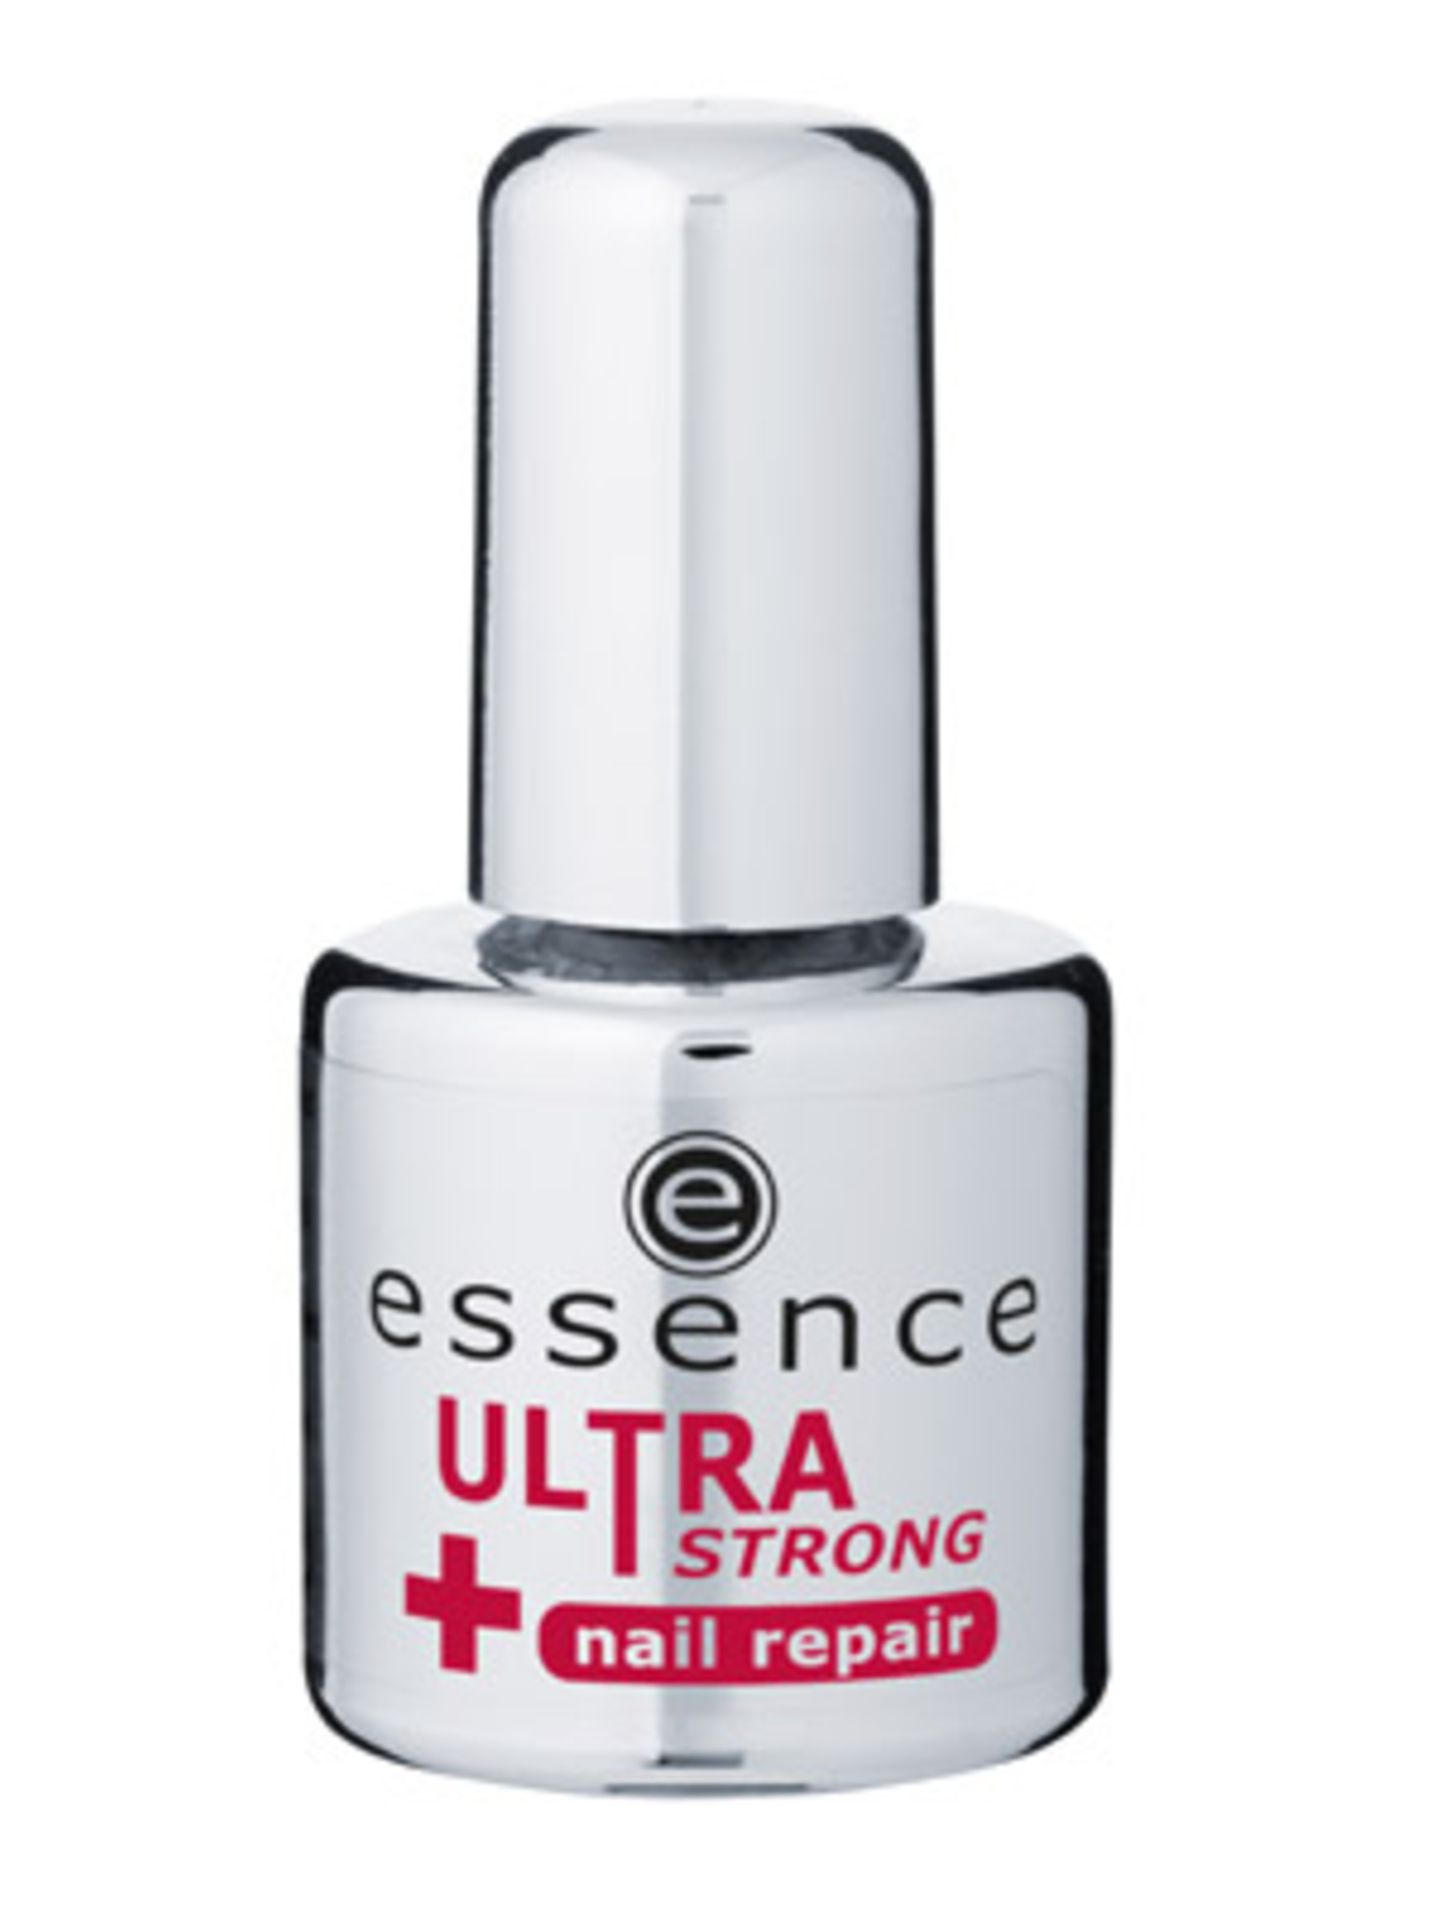 Extra starkes Nail-Repair-Fluid von Essence, um 1,80 Euro.